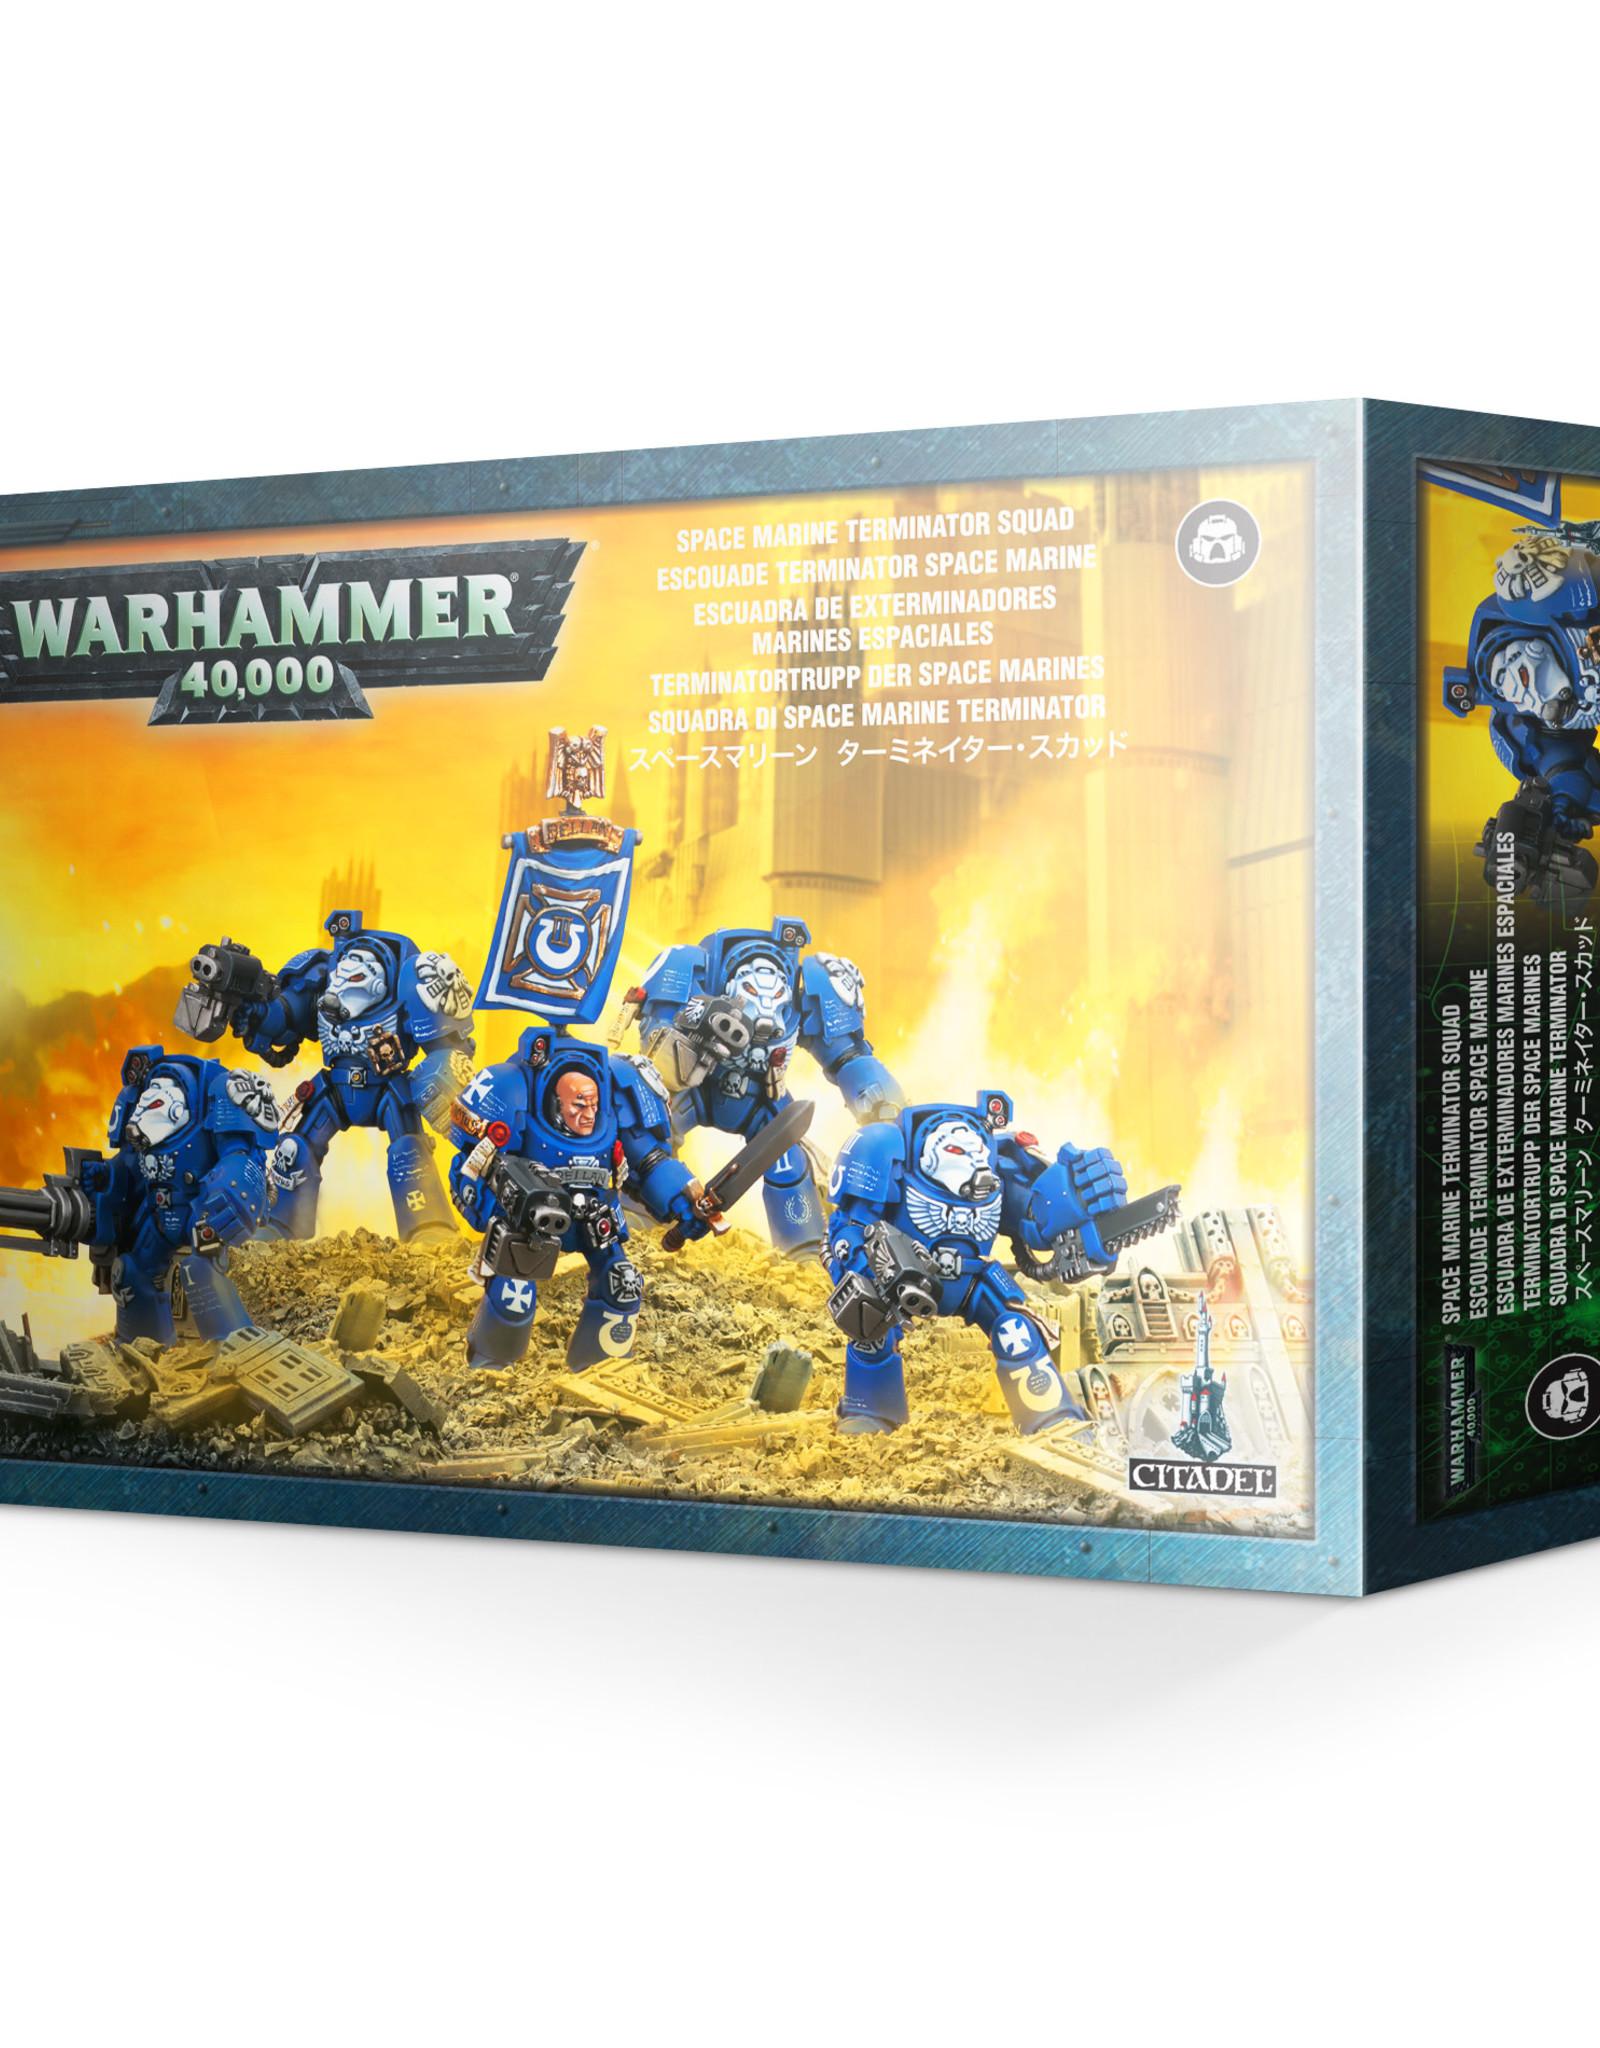 Warhammer 40K Space Marine Terminator Squad